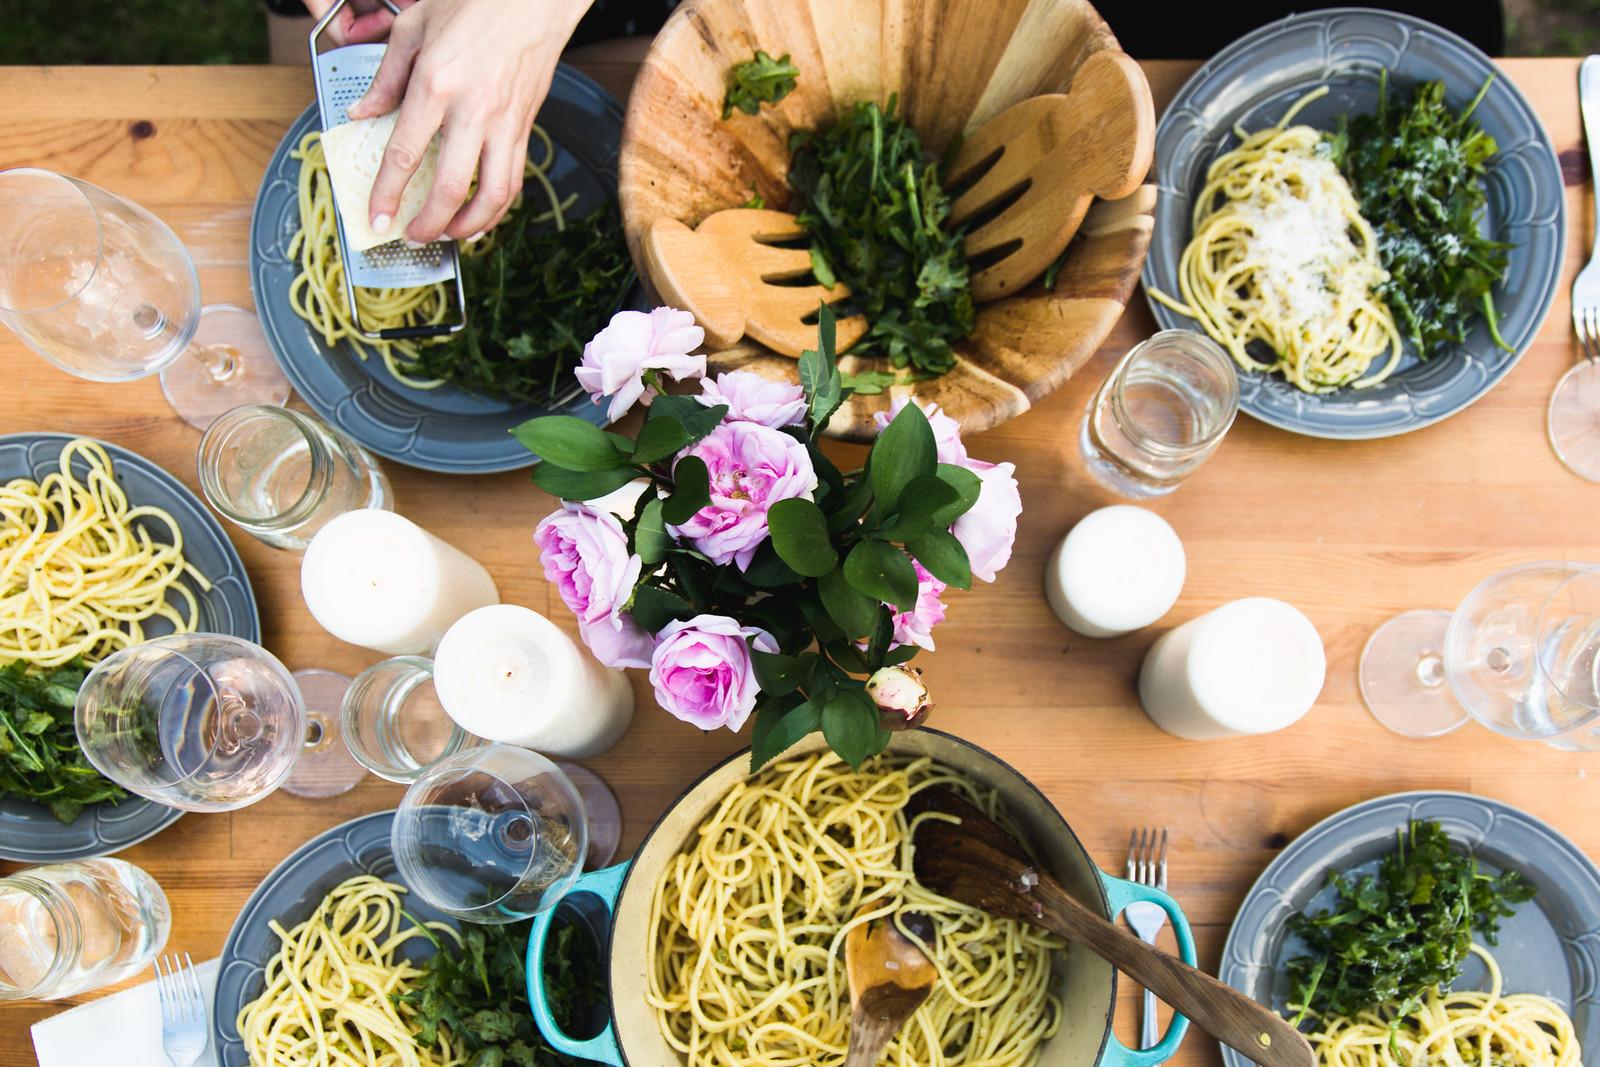 the fond life summer pasta recipe thumb-2-X3.jpg